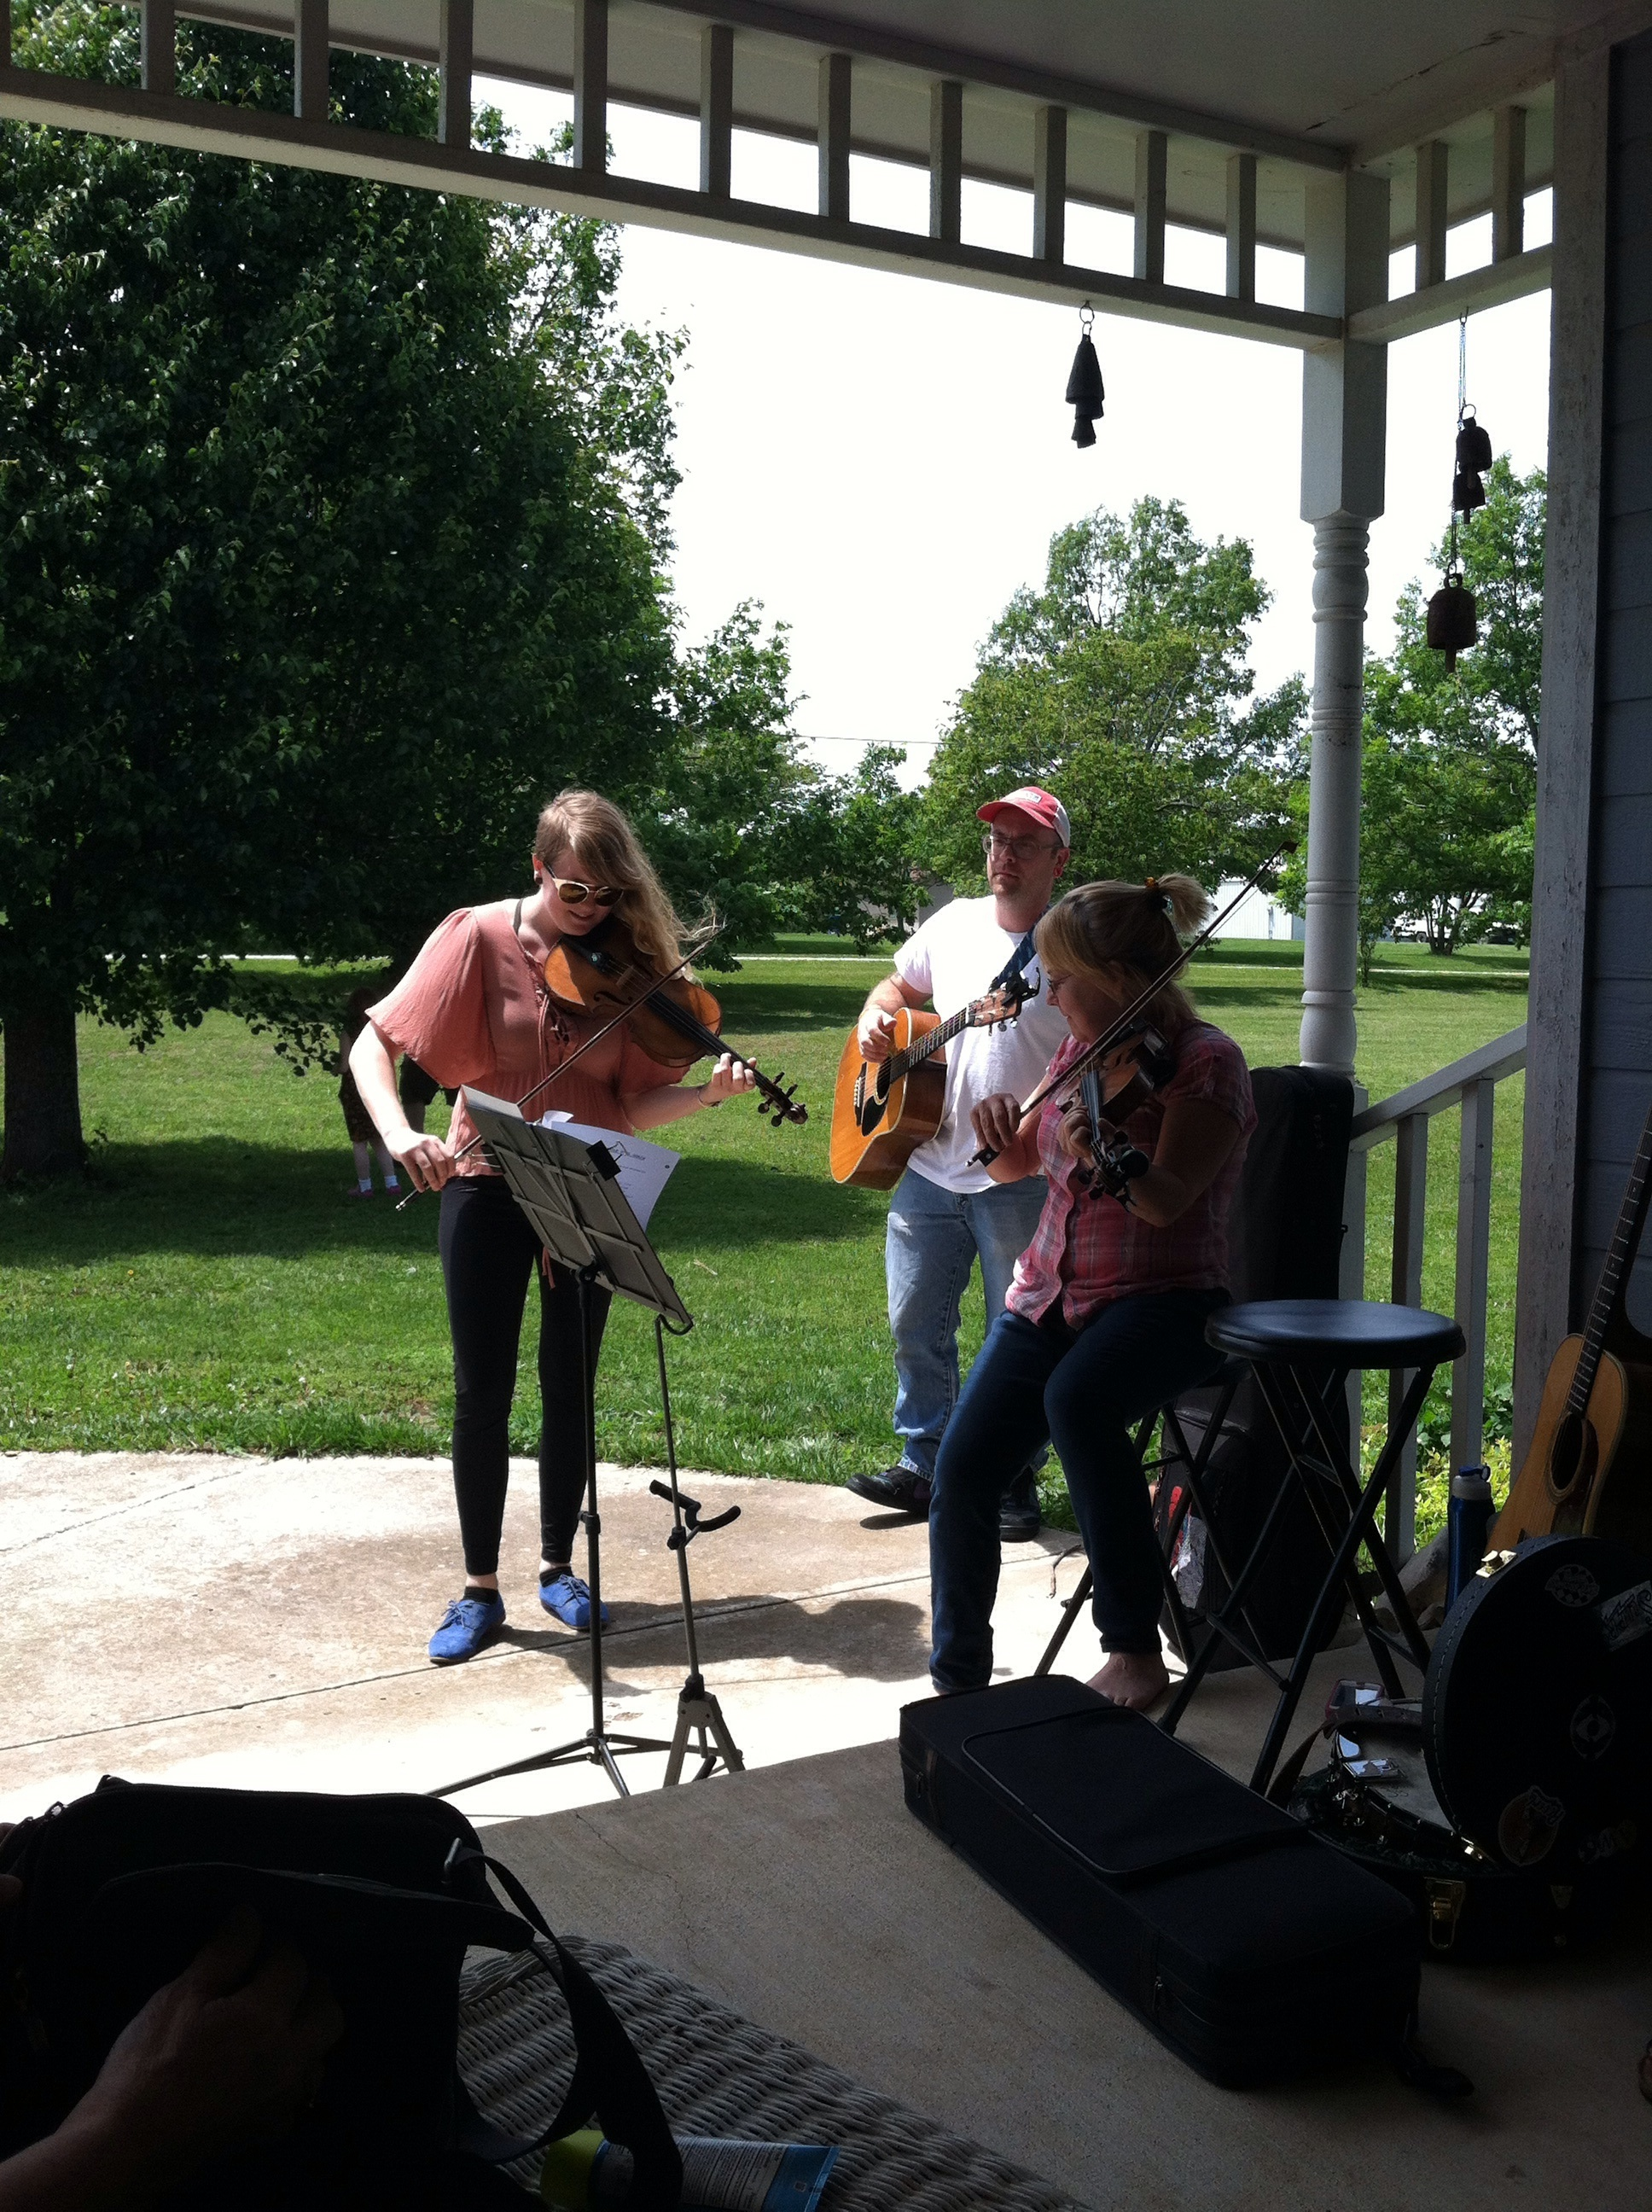 We were greeted by fun folk music.